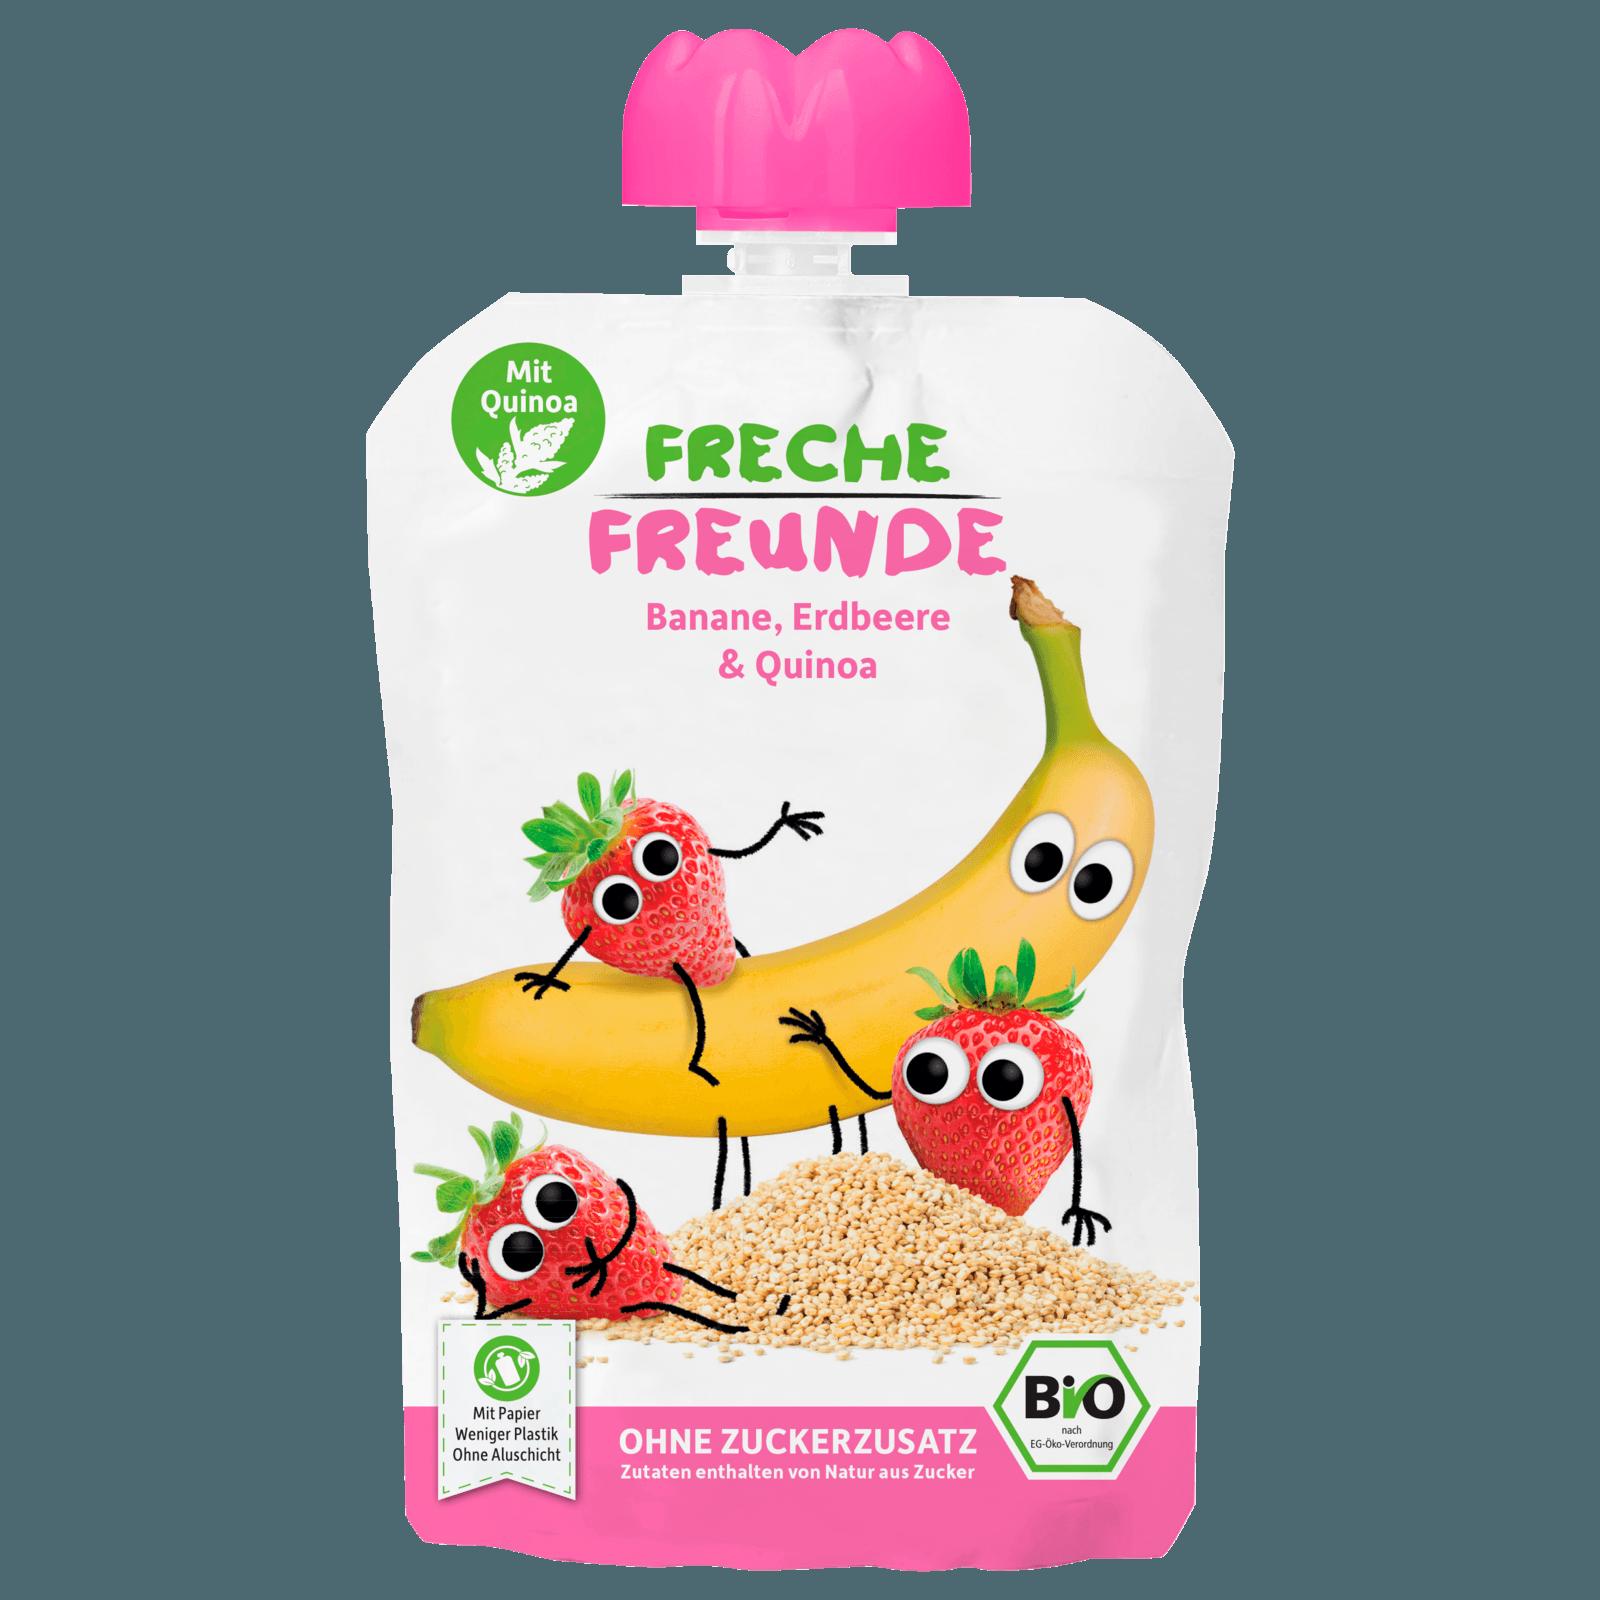 Erdbär Freche Freunde Banane, Erdbeer & Quinoa 100g